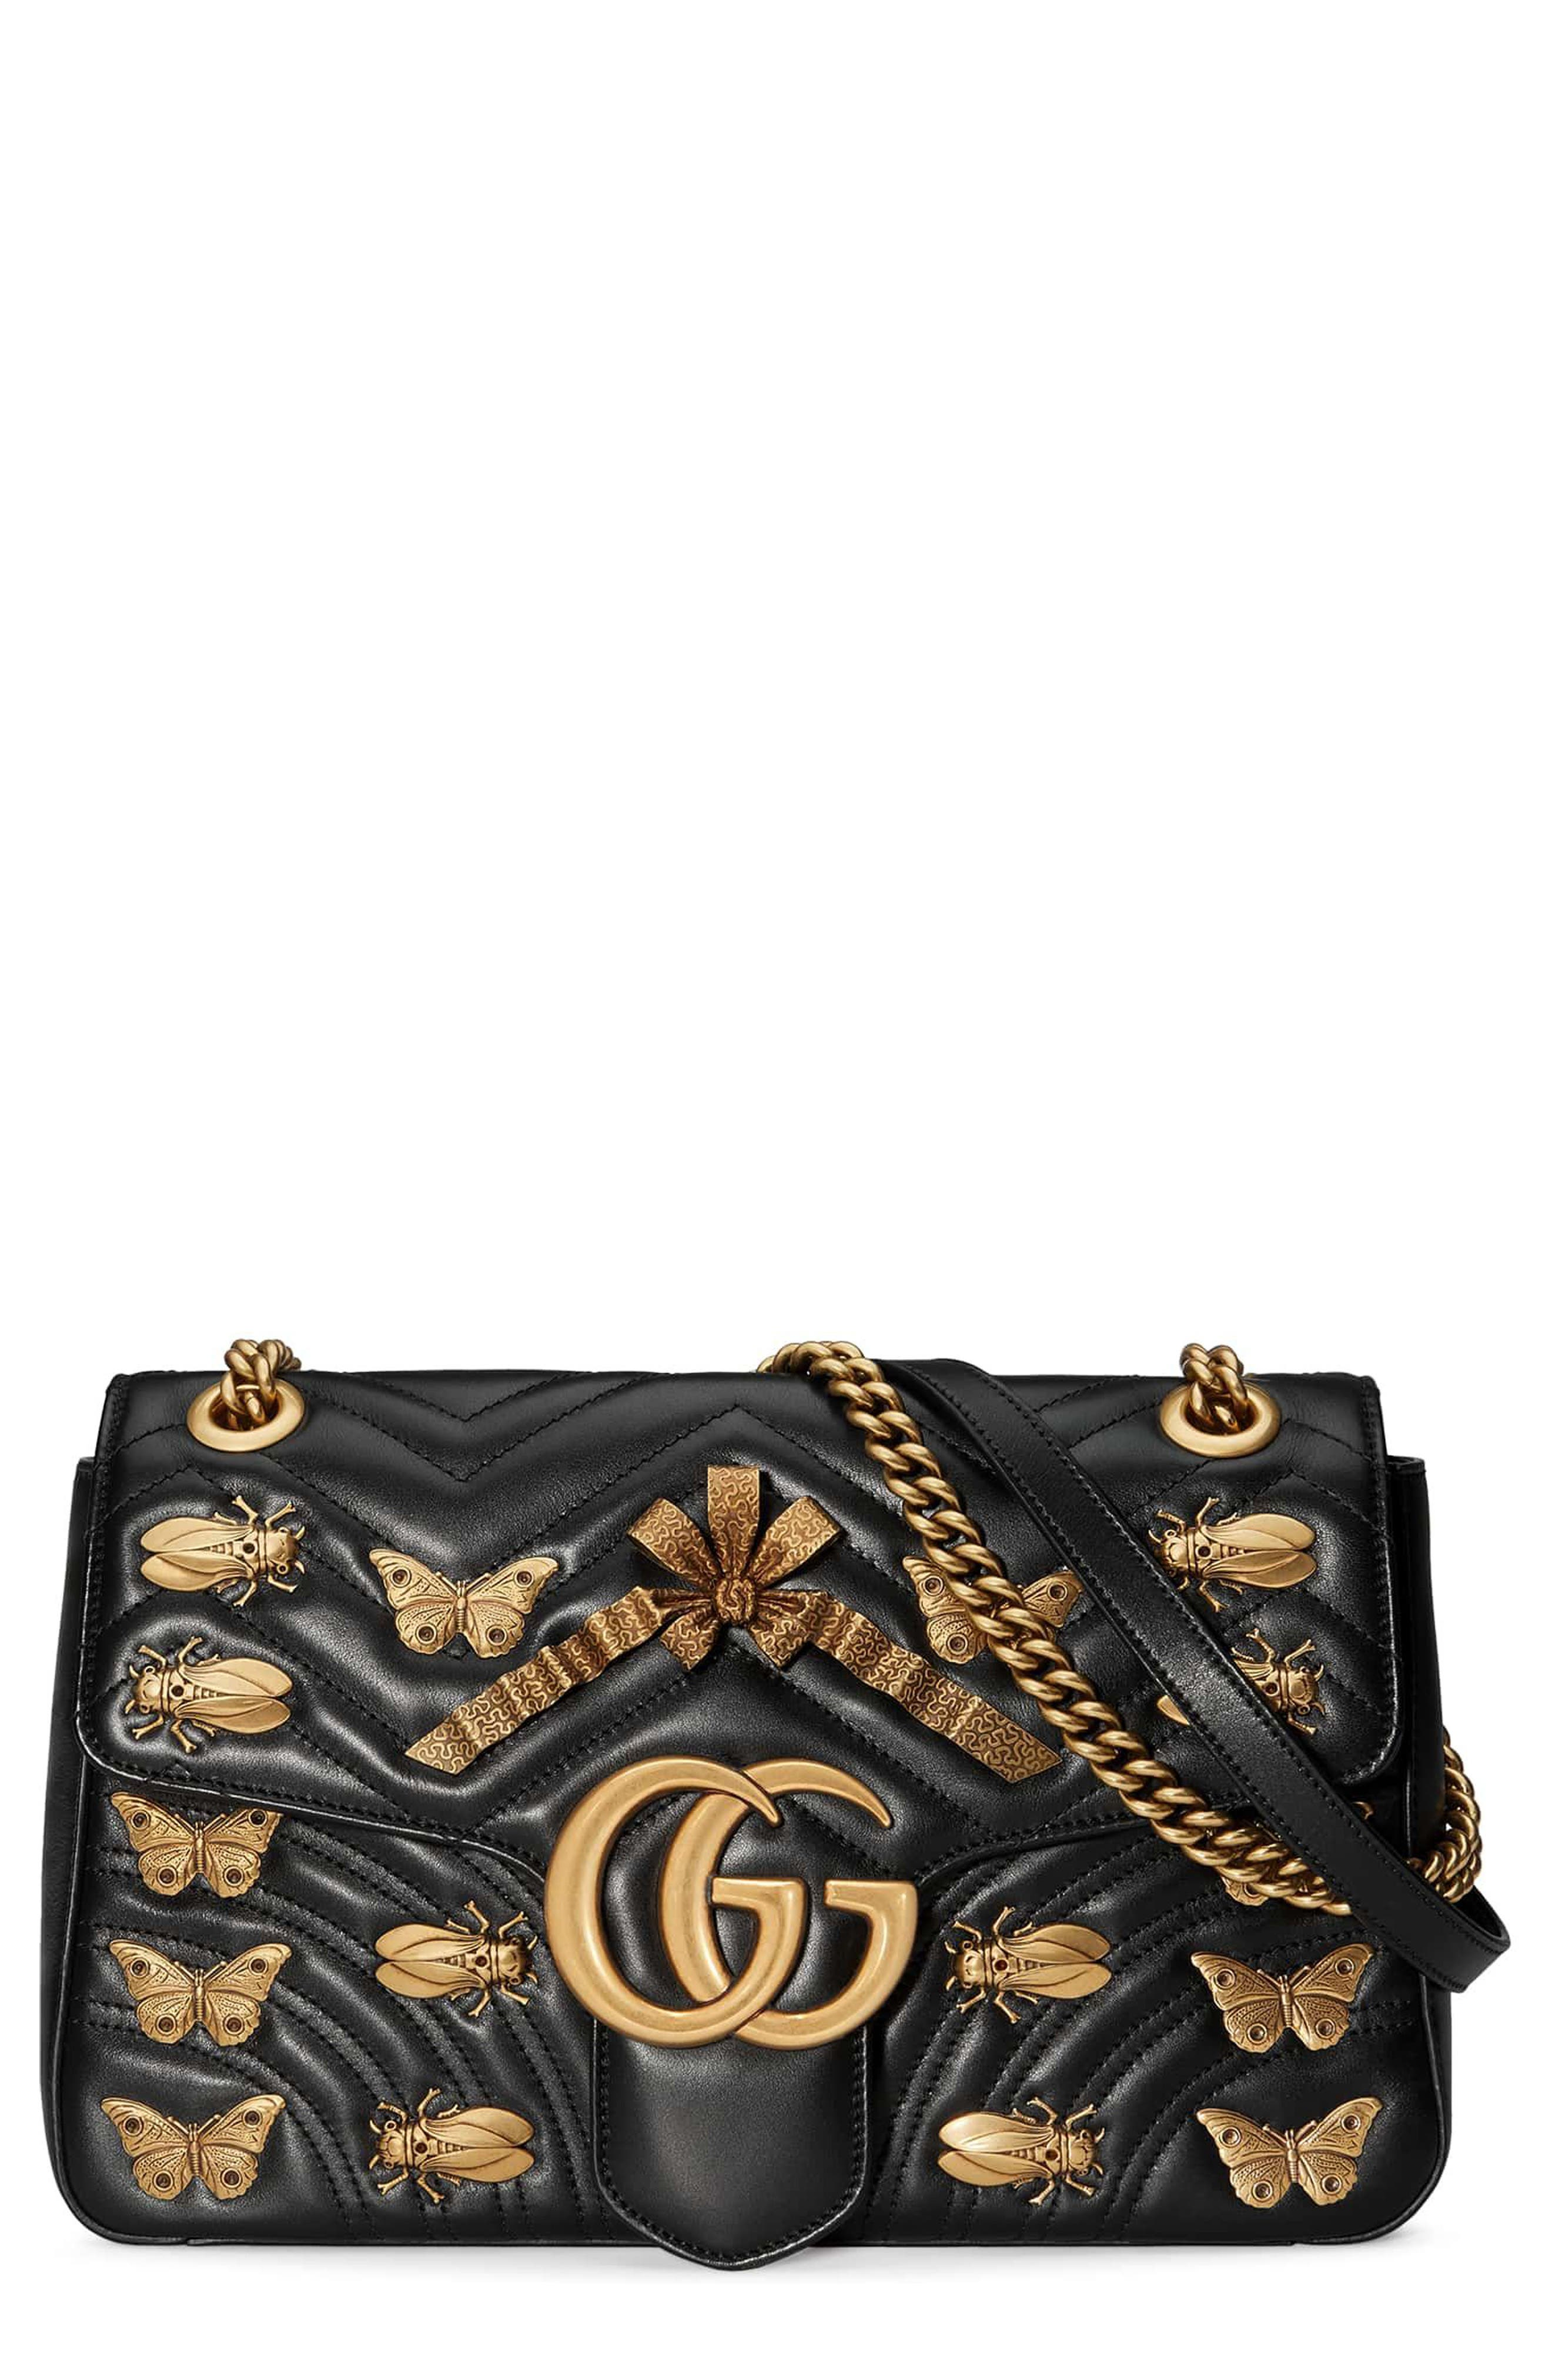 Gucci Medium GG Marmont 2.0 Animal Stud Matelassé Leather Shoulder Bag